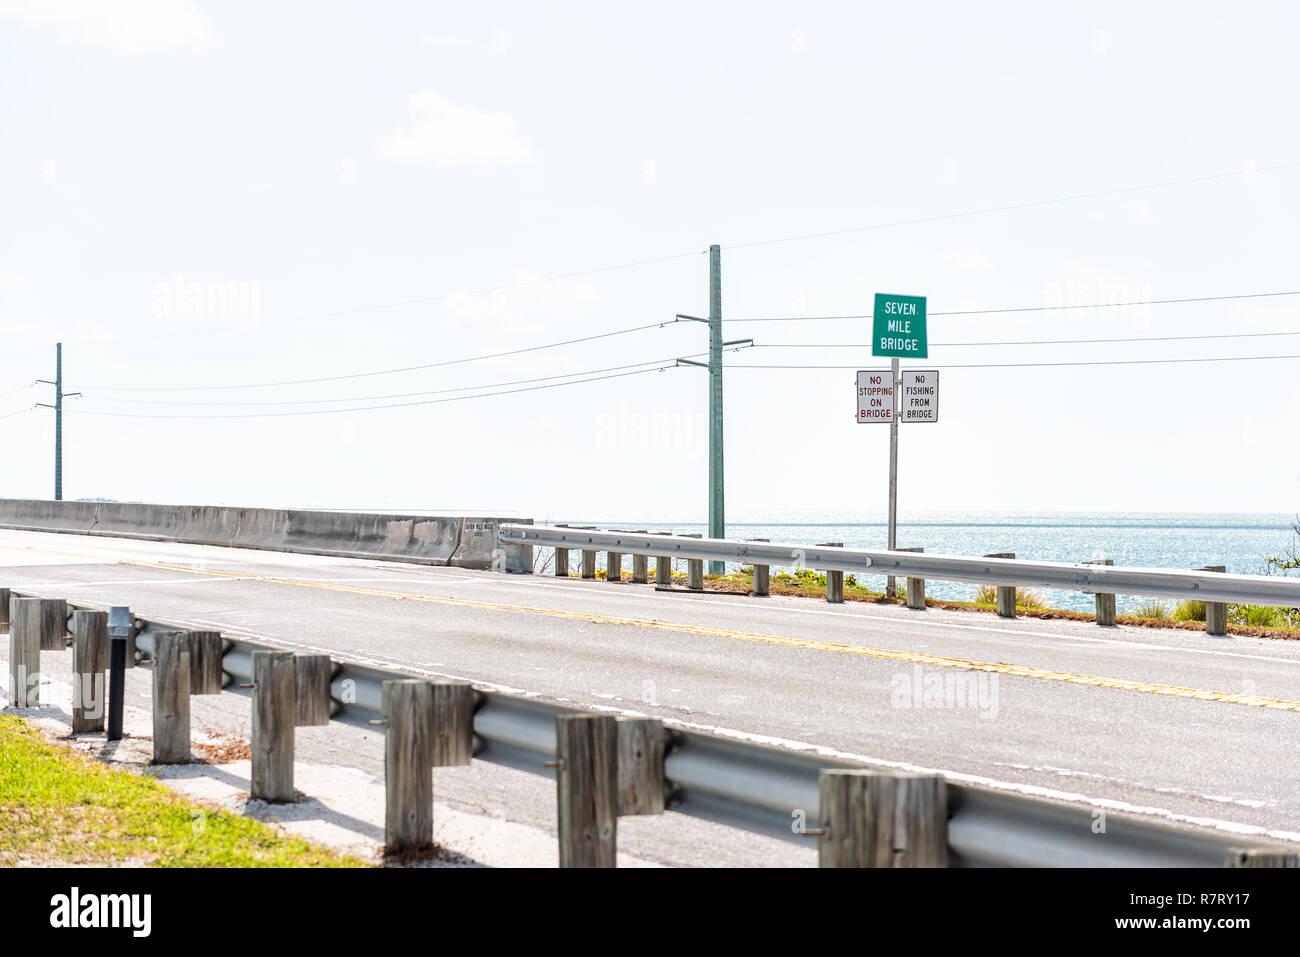 Florida Keys, Overseas Highway Road, Seven Mile bridge in Oceano Atlantico, Golfo del Messico, Horizon, nessuno Immagini Stock